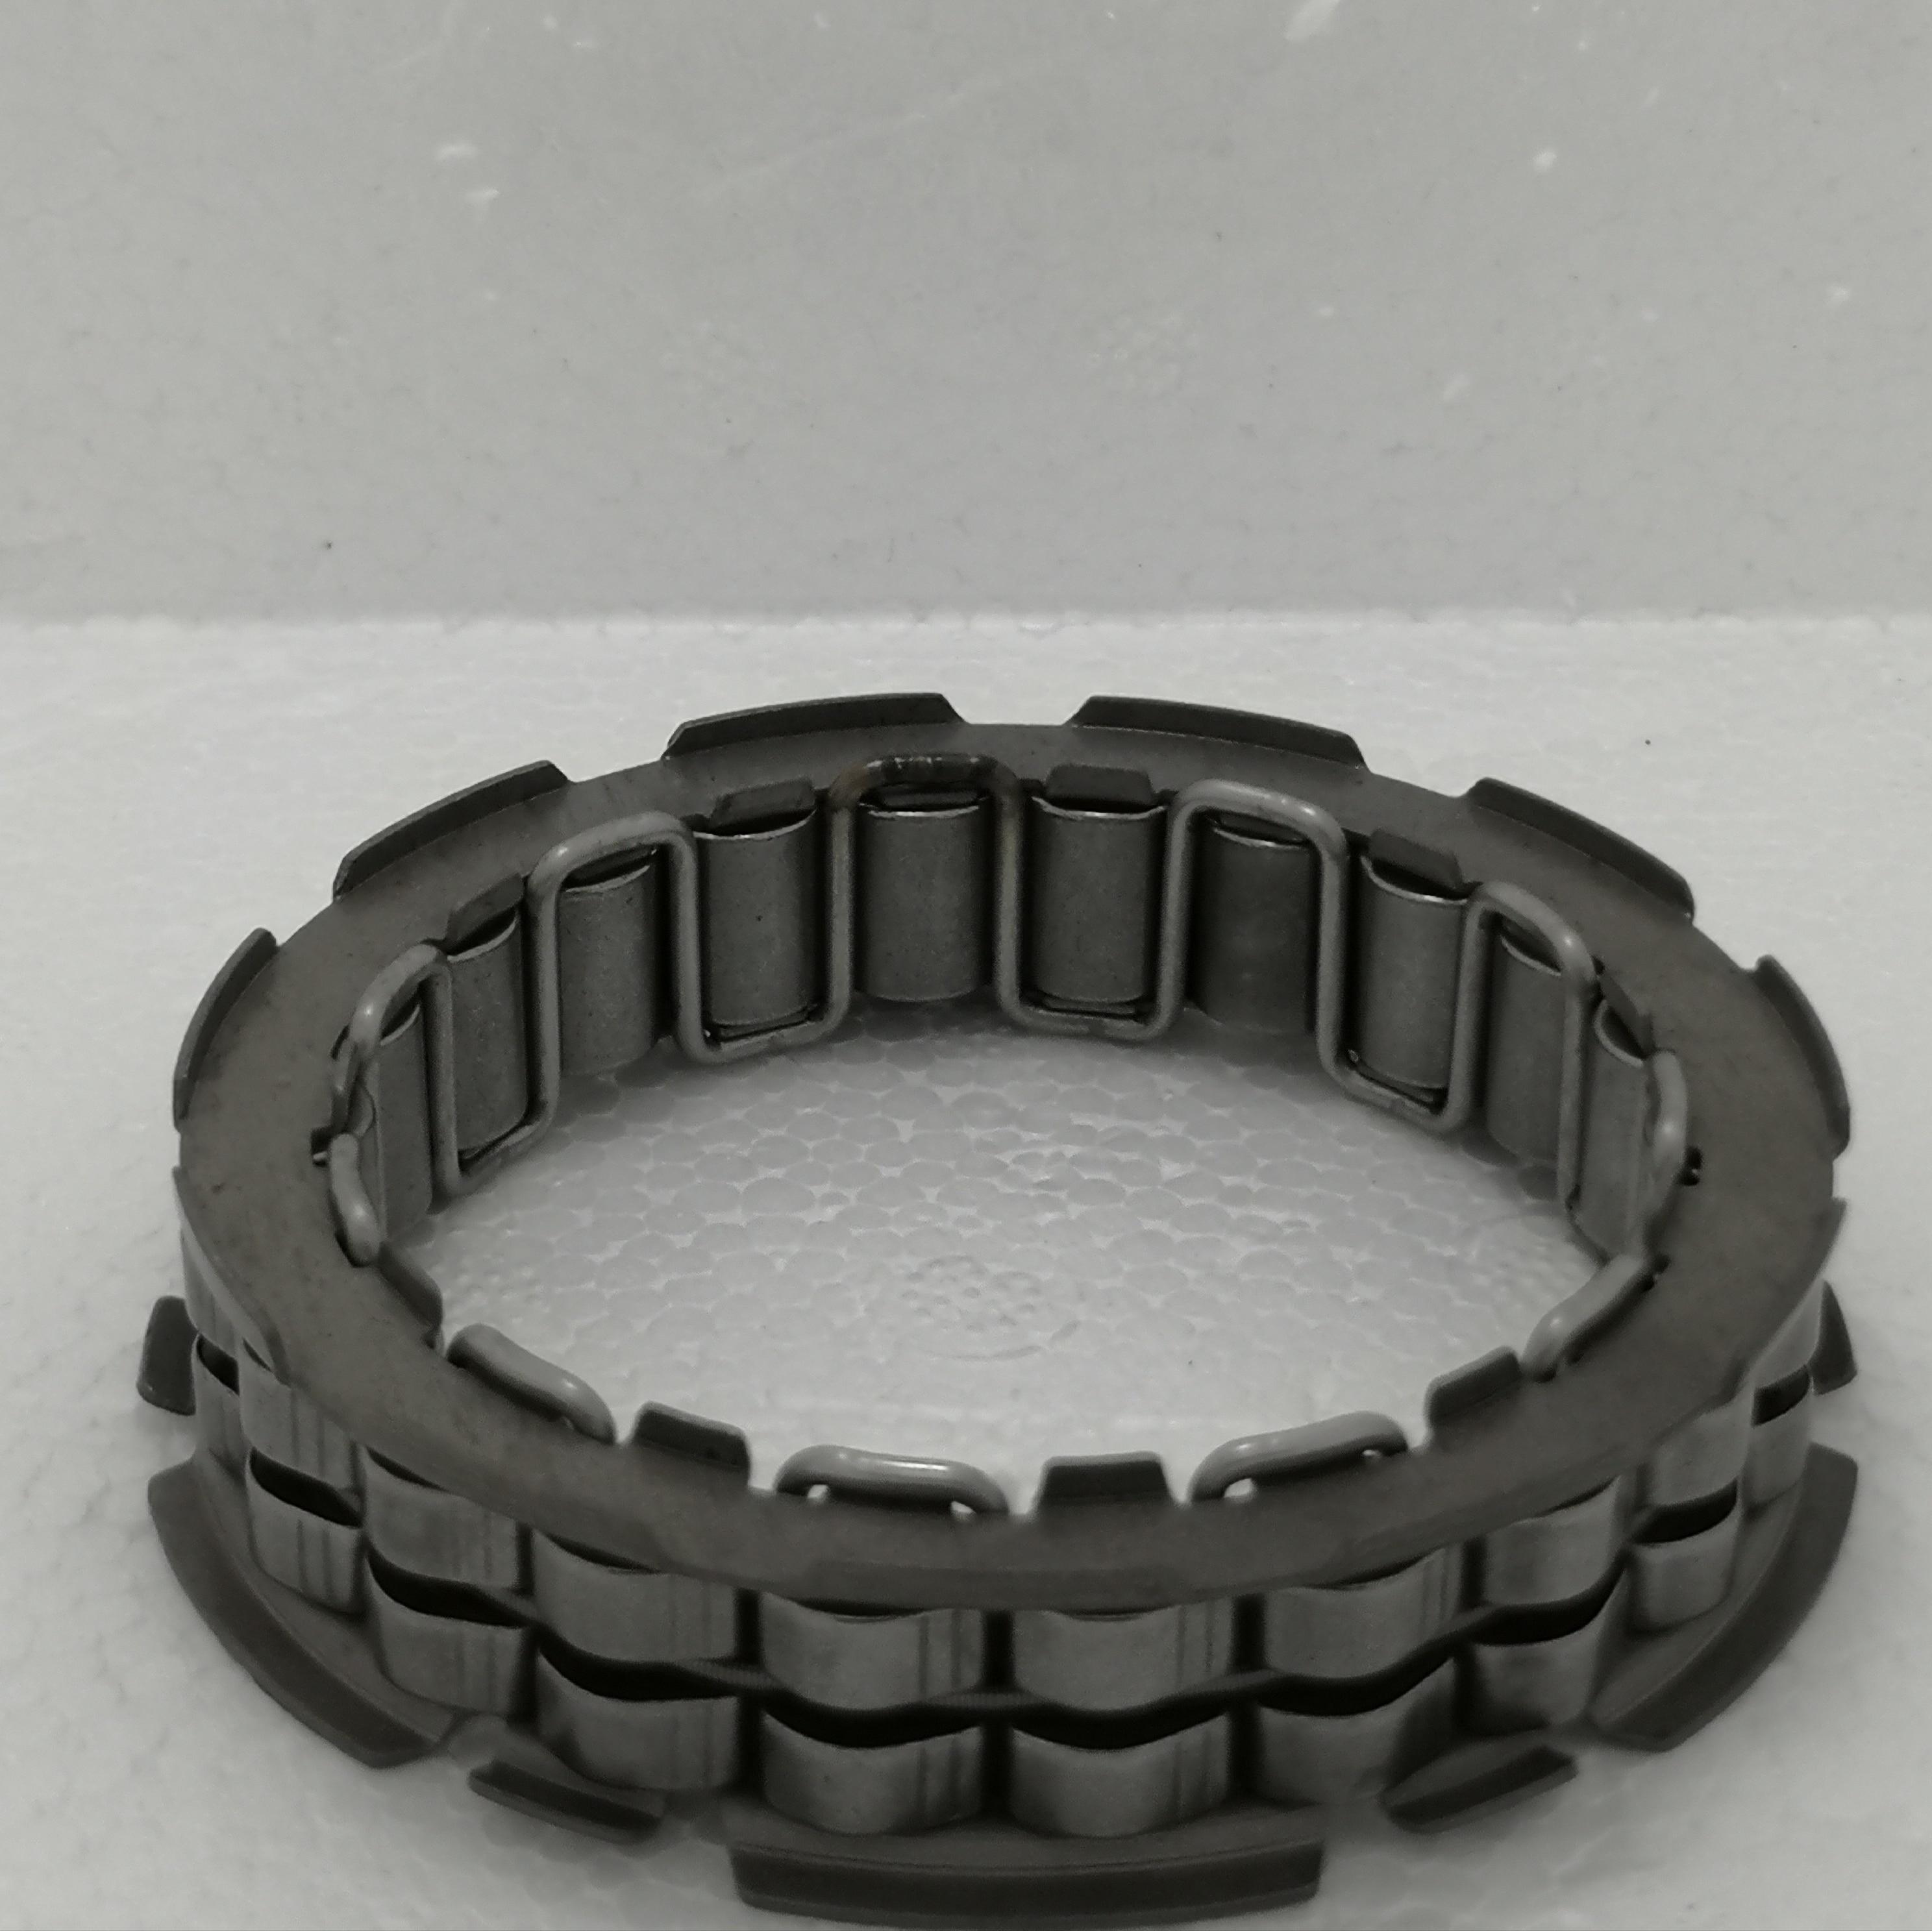 Big Roller Reinforced One Way Bearing Starter Sprag Clutch Beads For YAMAHA Raptor 700 Raptor700 2006